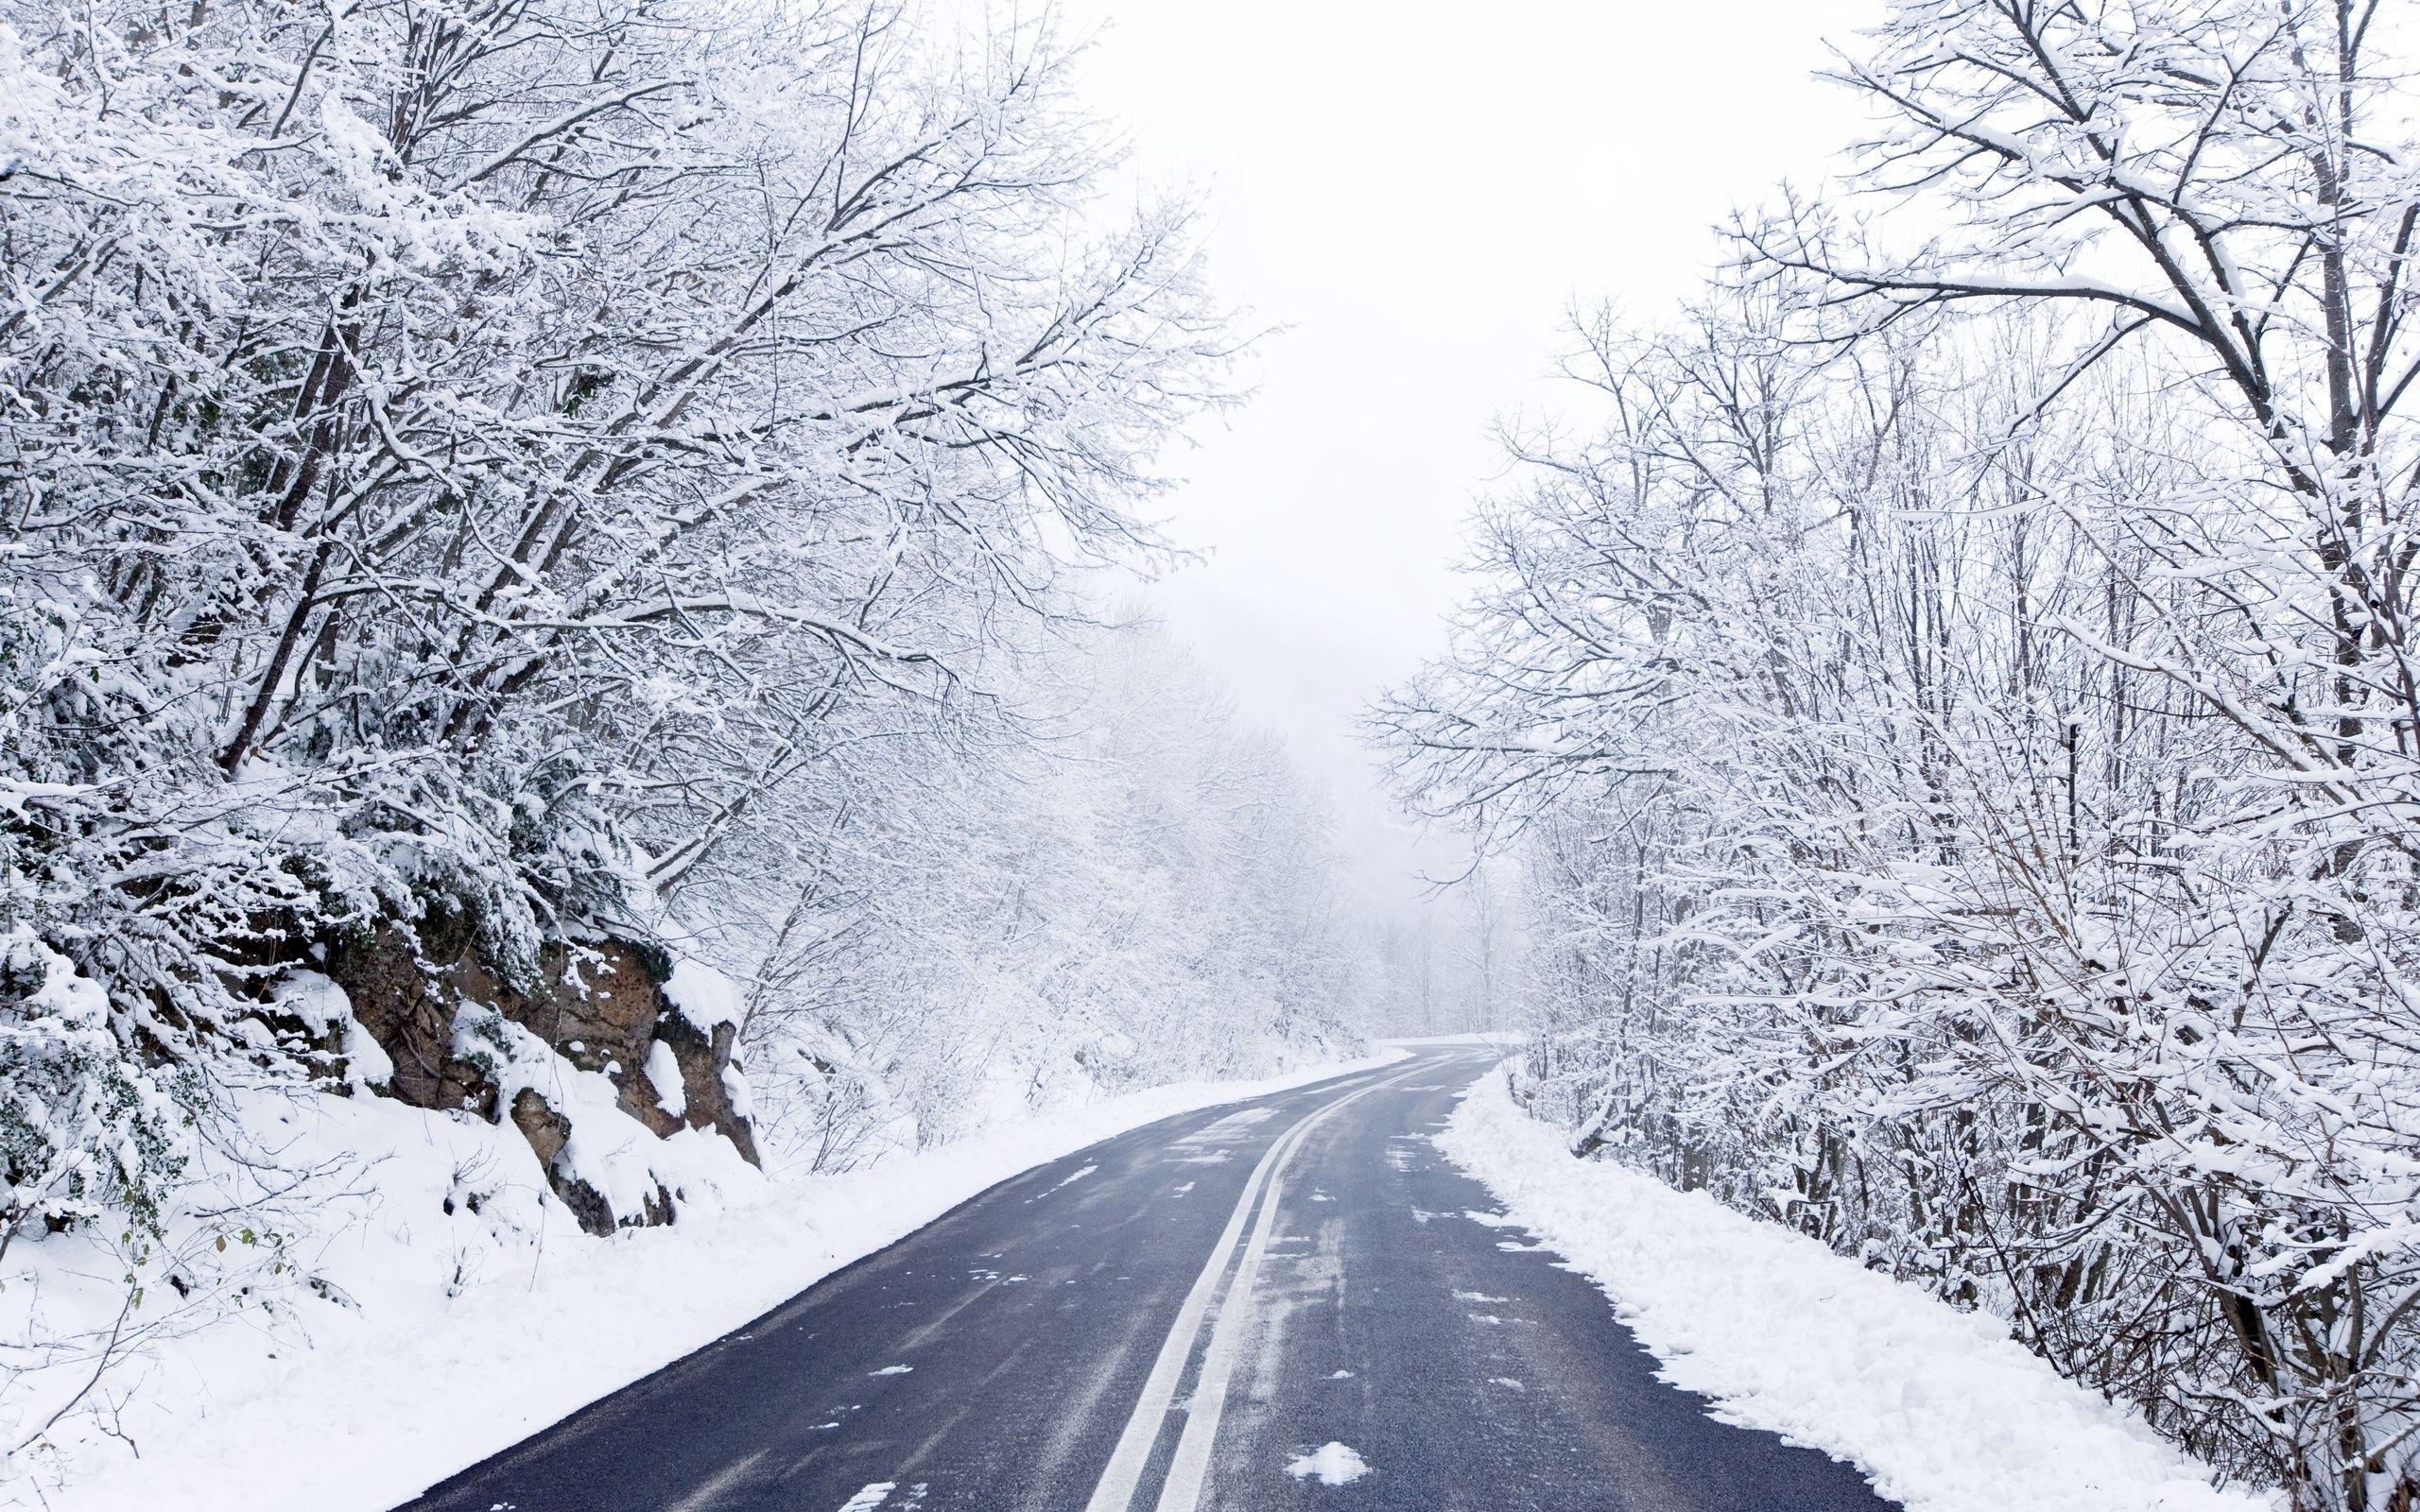 Winter Road S Wallpaper 1920x1080 82111 Winter Scenery Winter Background Winter Road